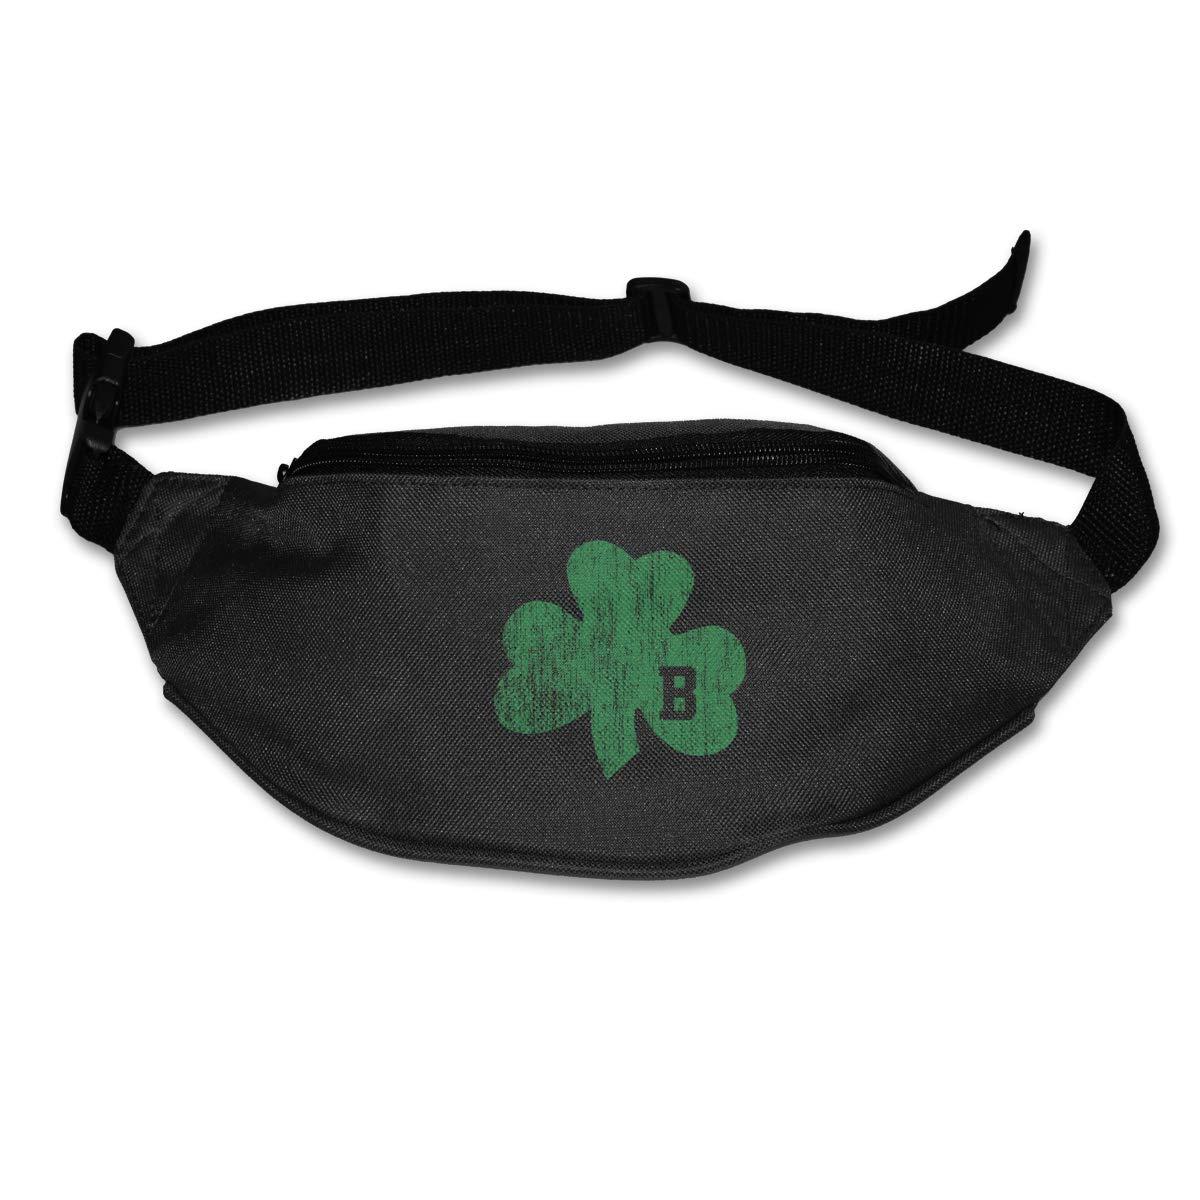 Boston Shamrock 1 Sport Waist Pack Fanny Pack Adjustable For Hike